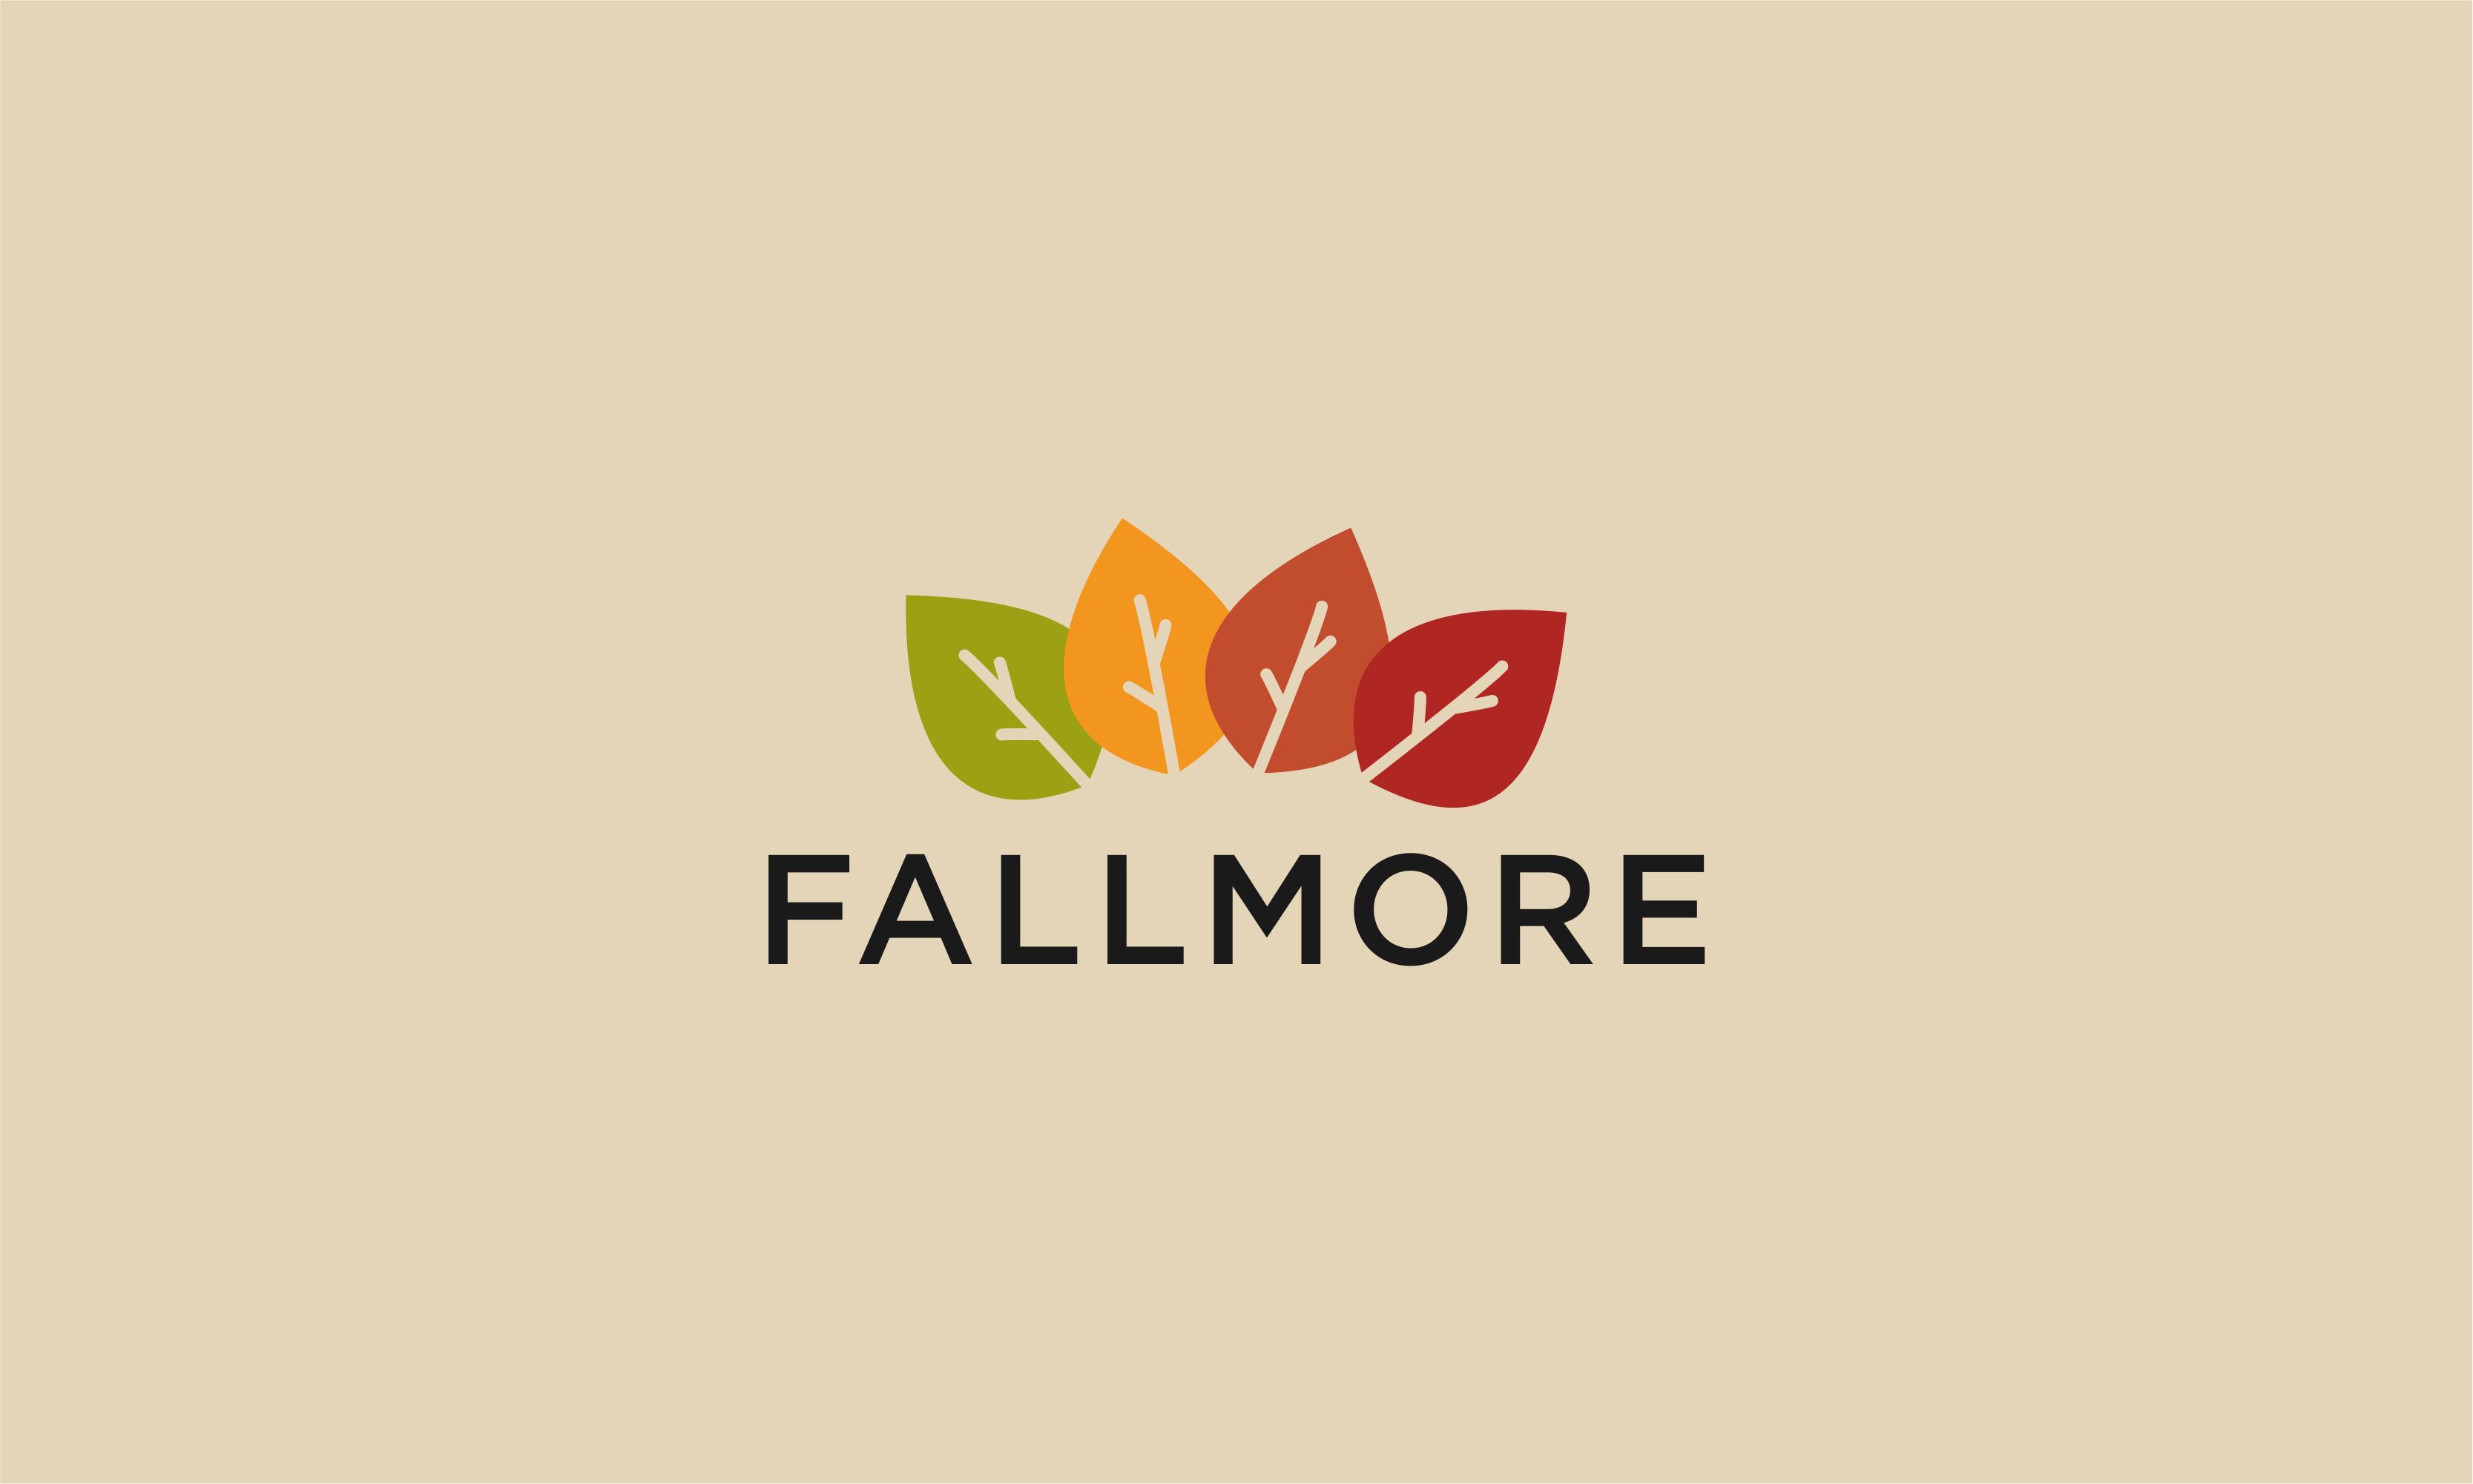 Fallmore